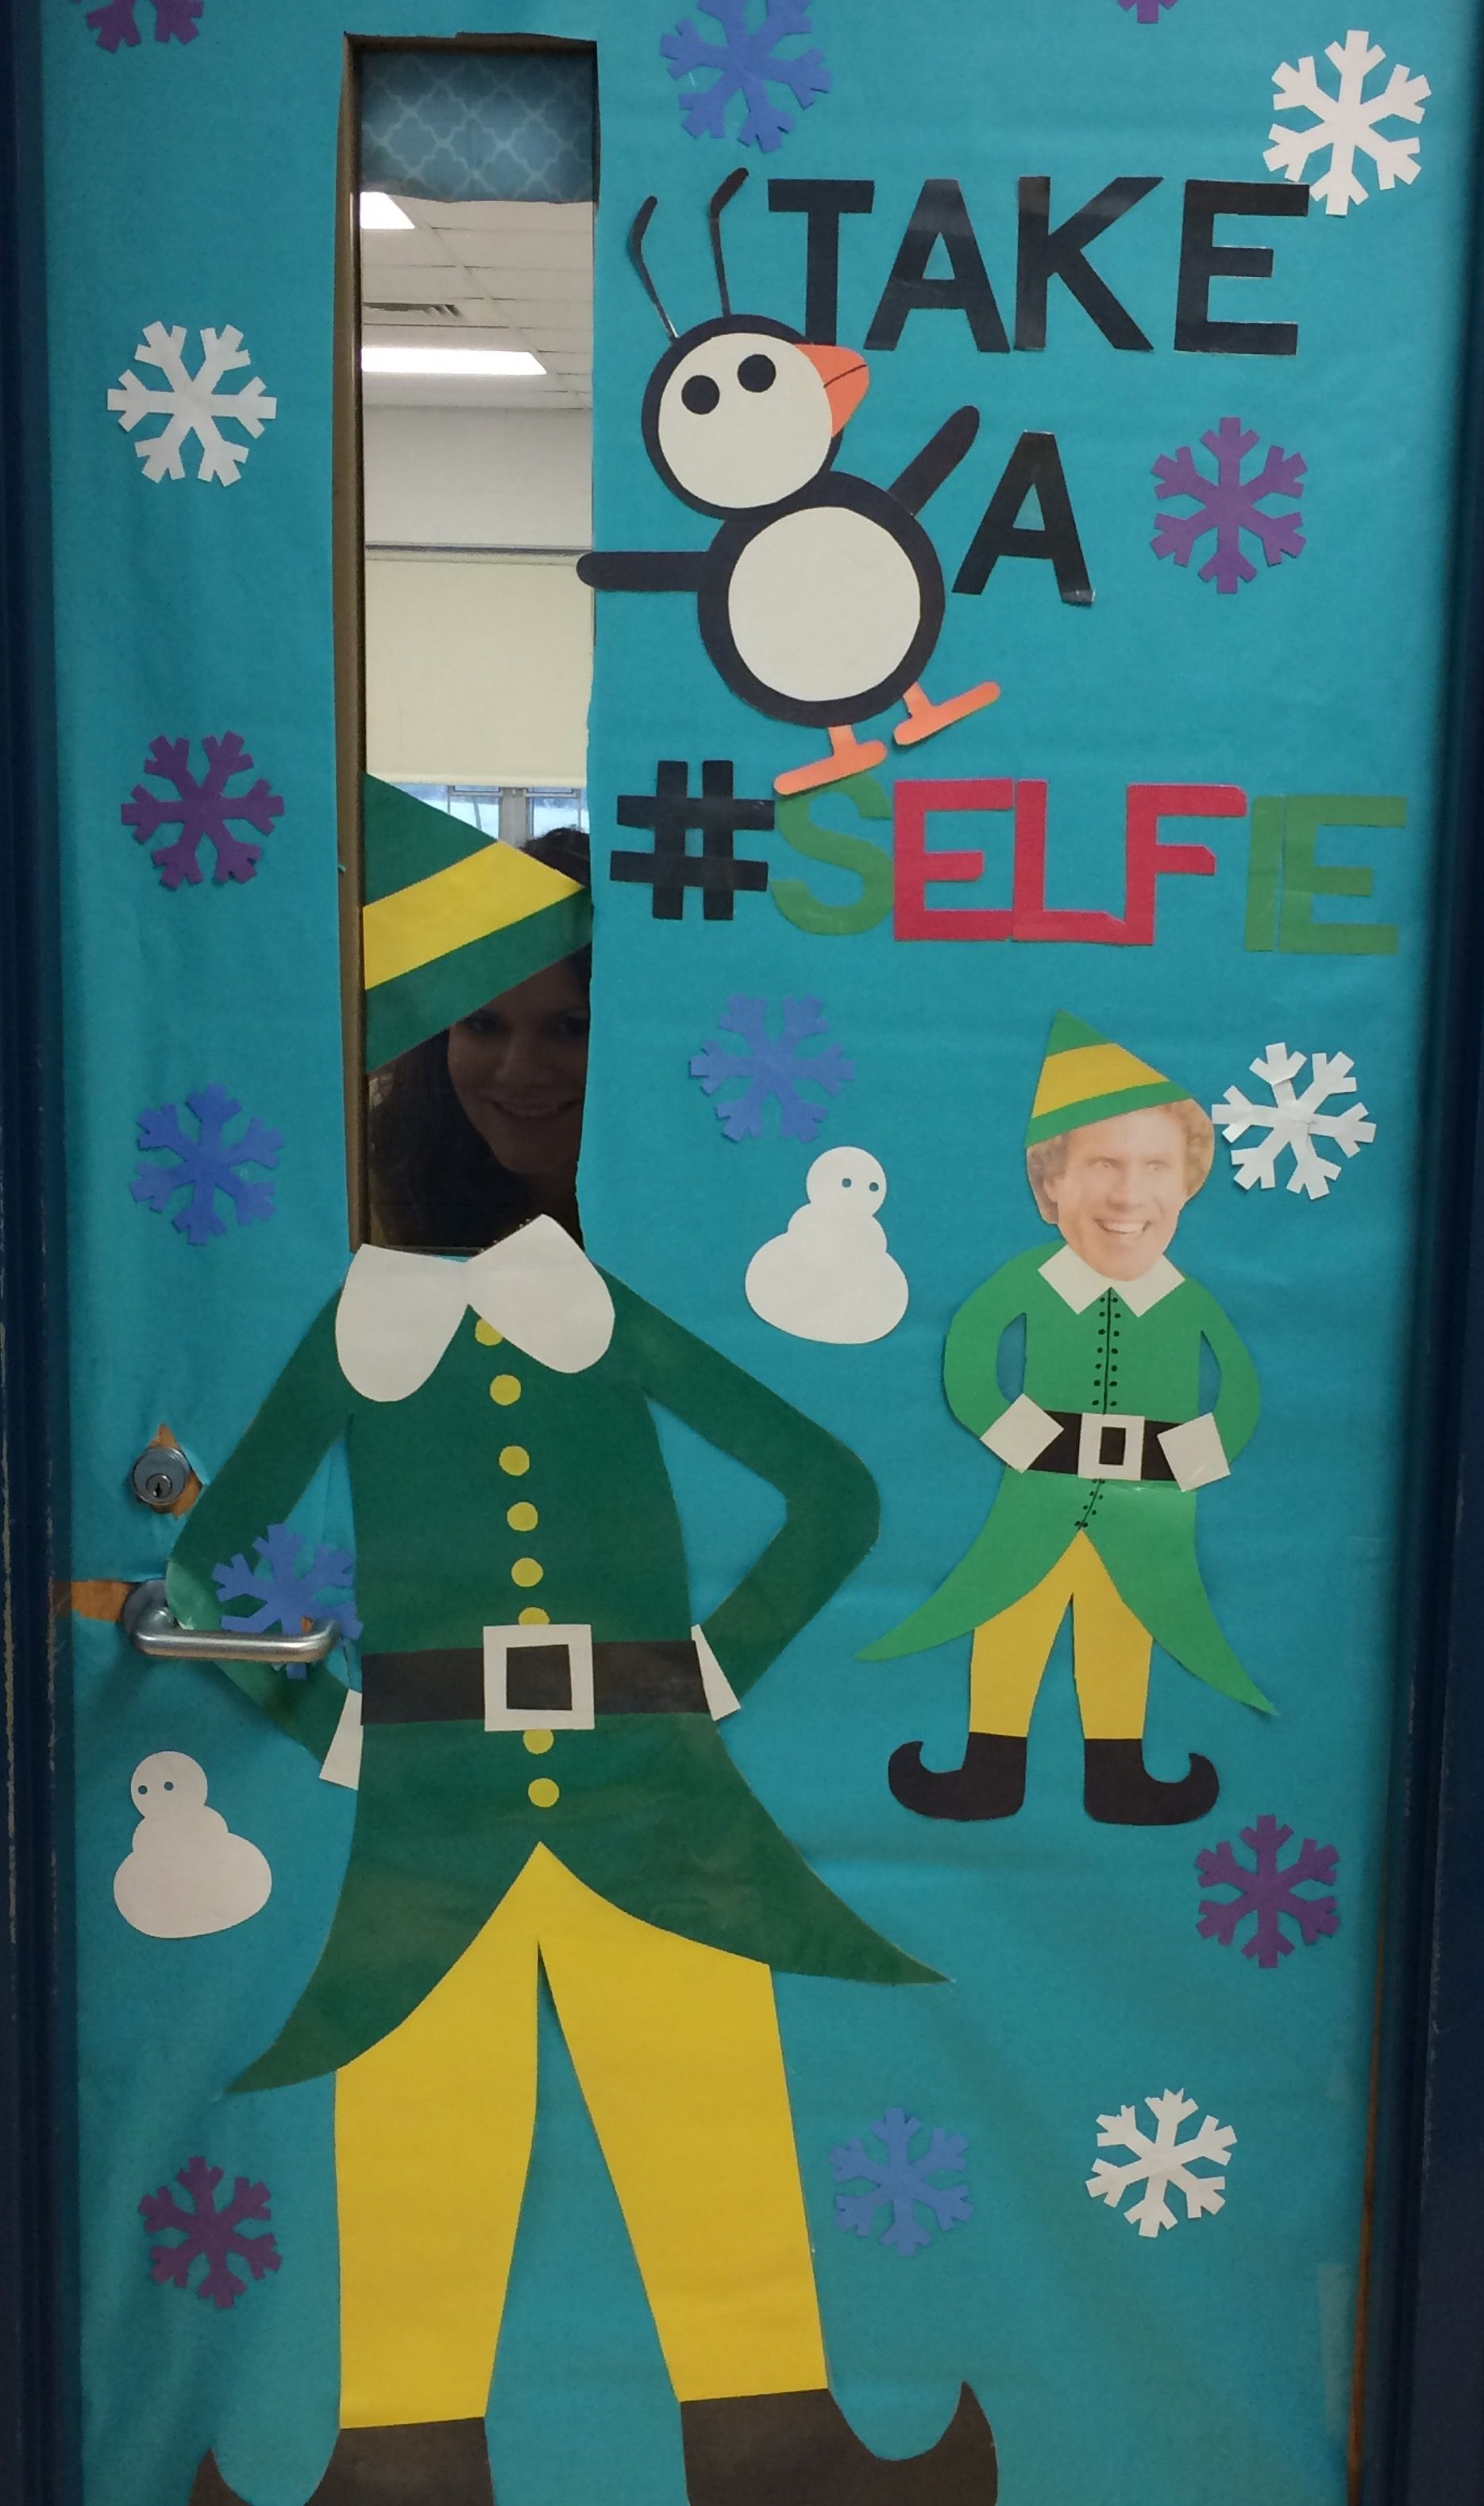 christmas door decorating ideas pinterest christmas door ideas selfie buddy the elf education education